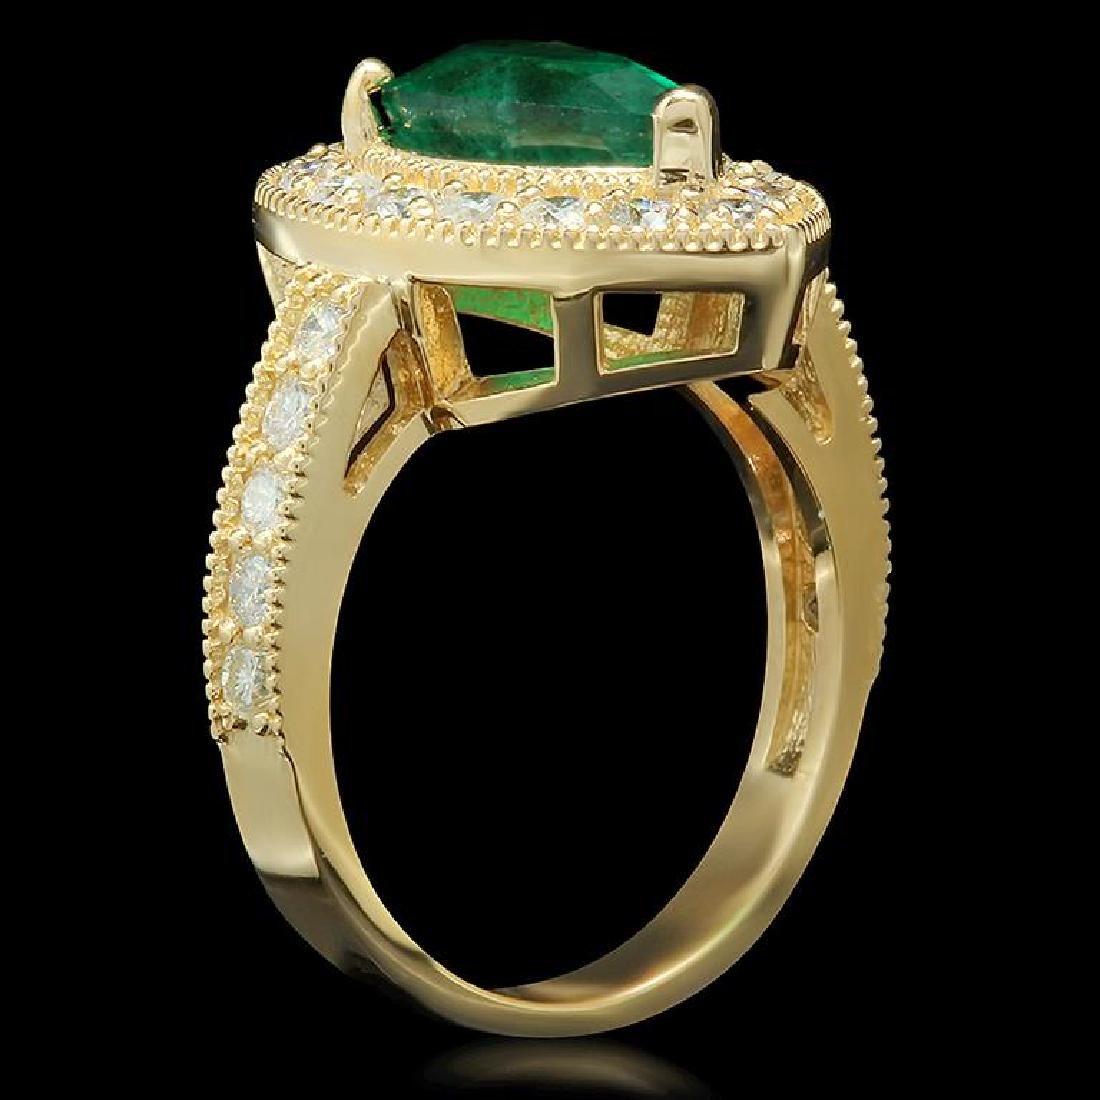 14K Gold 2.21ct Emerald 1.20ct Diamond Ring - 2